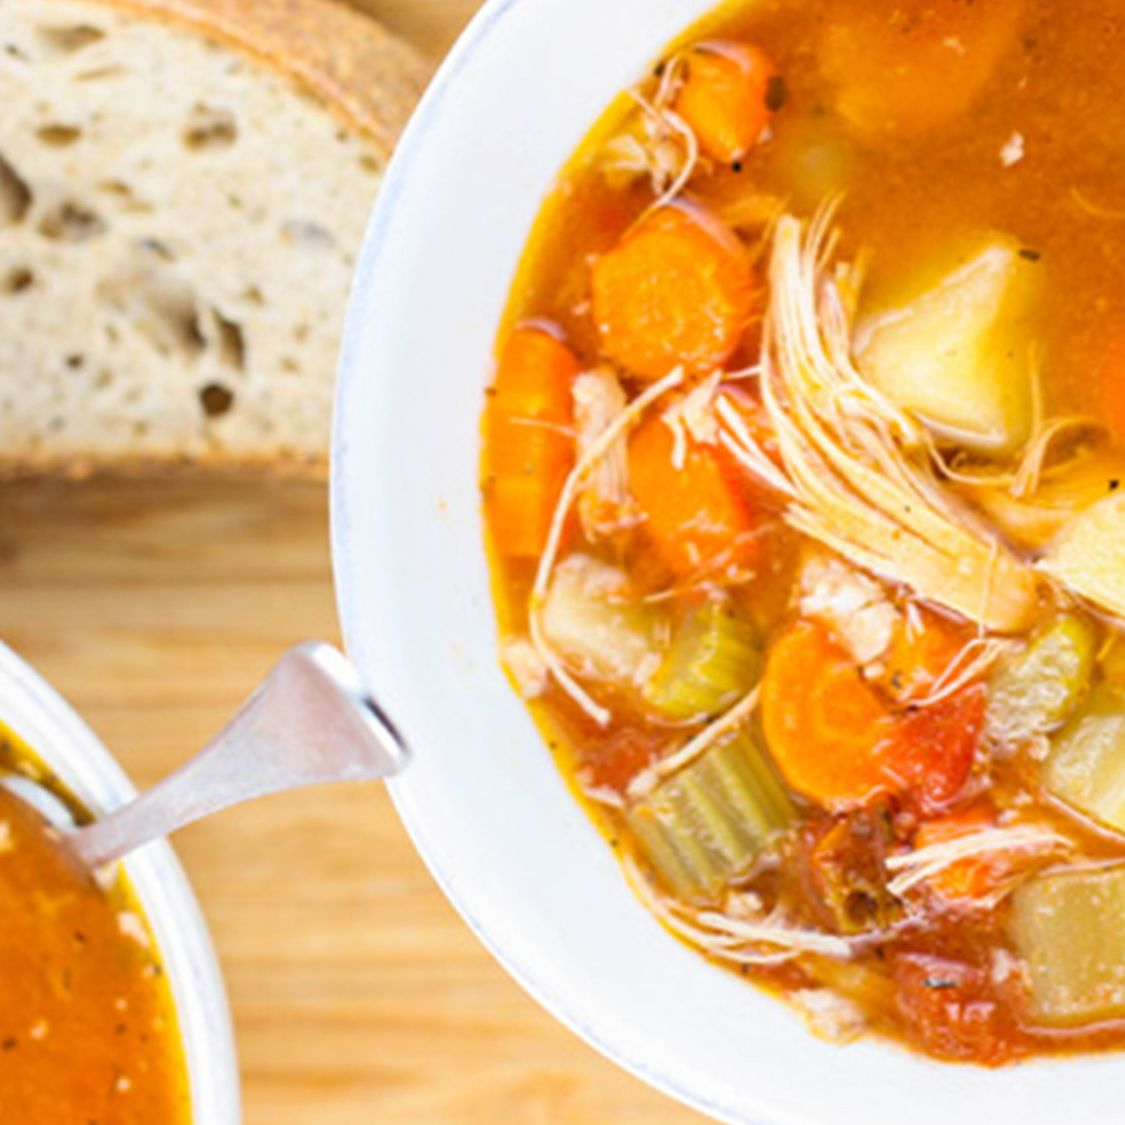 zesty_crockpot_chicken_and_potato_stew.jpg